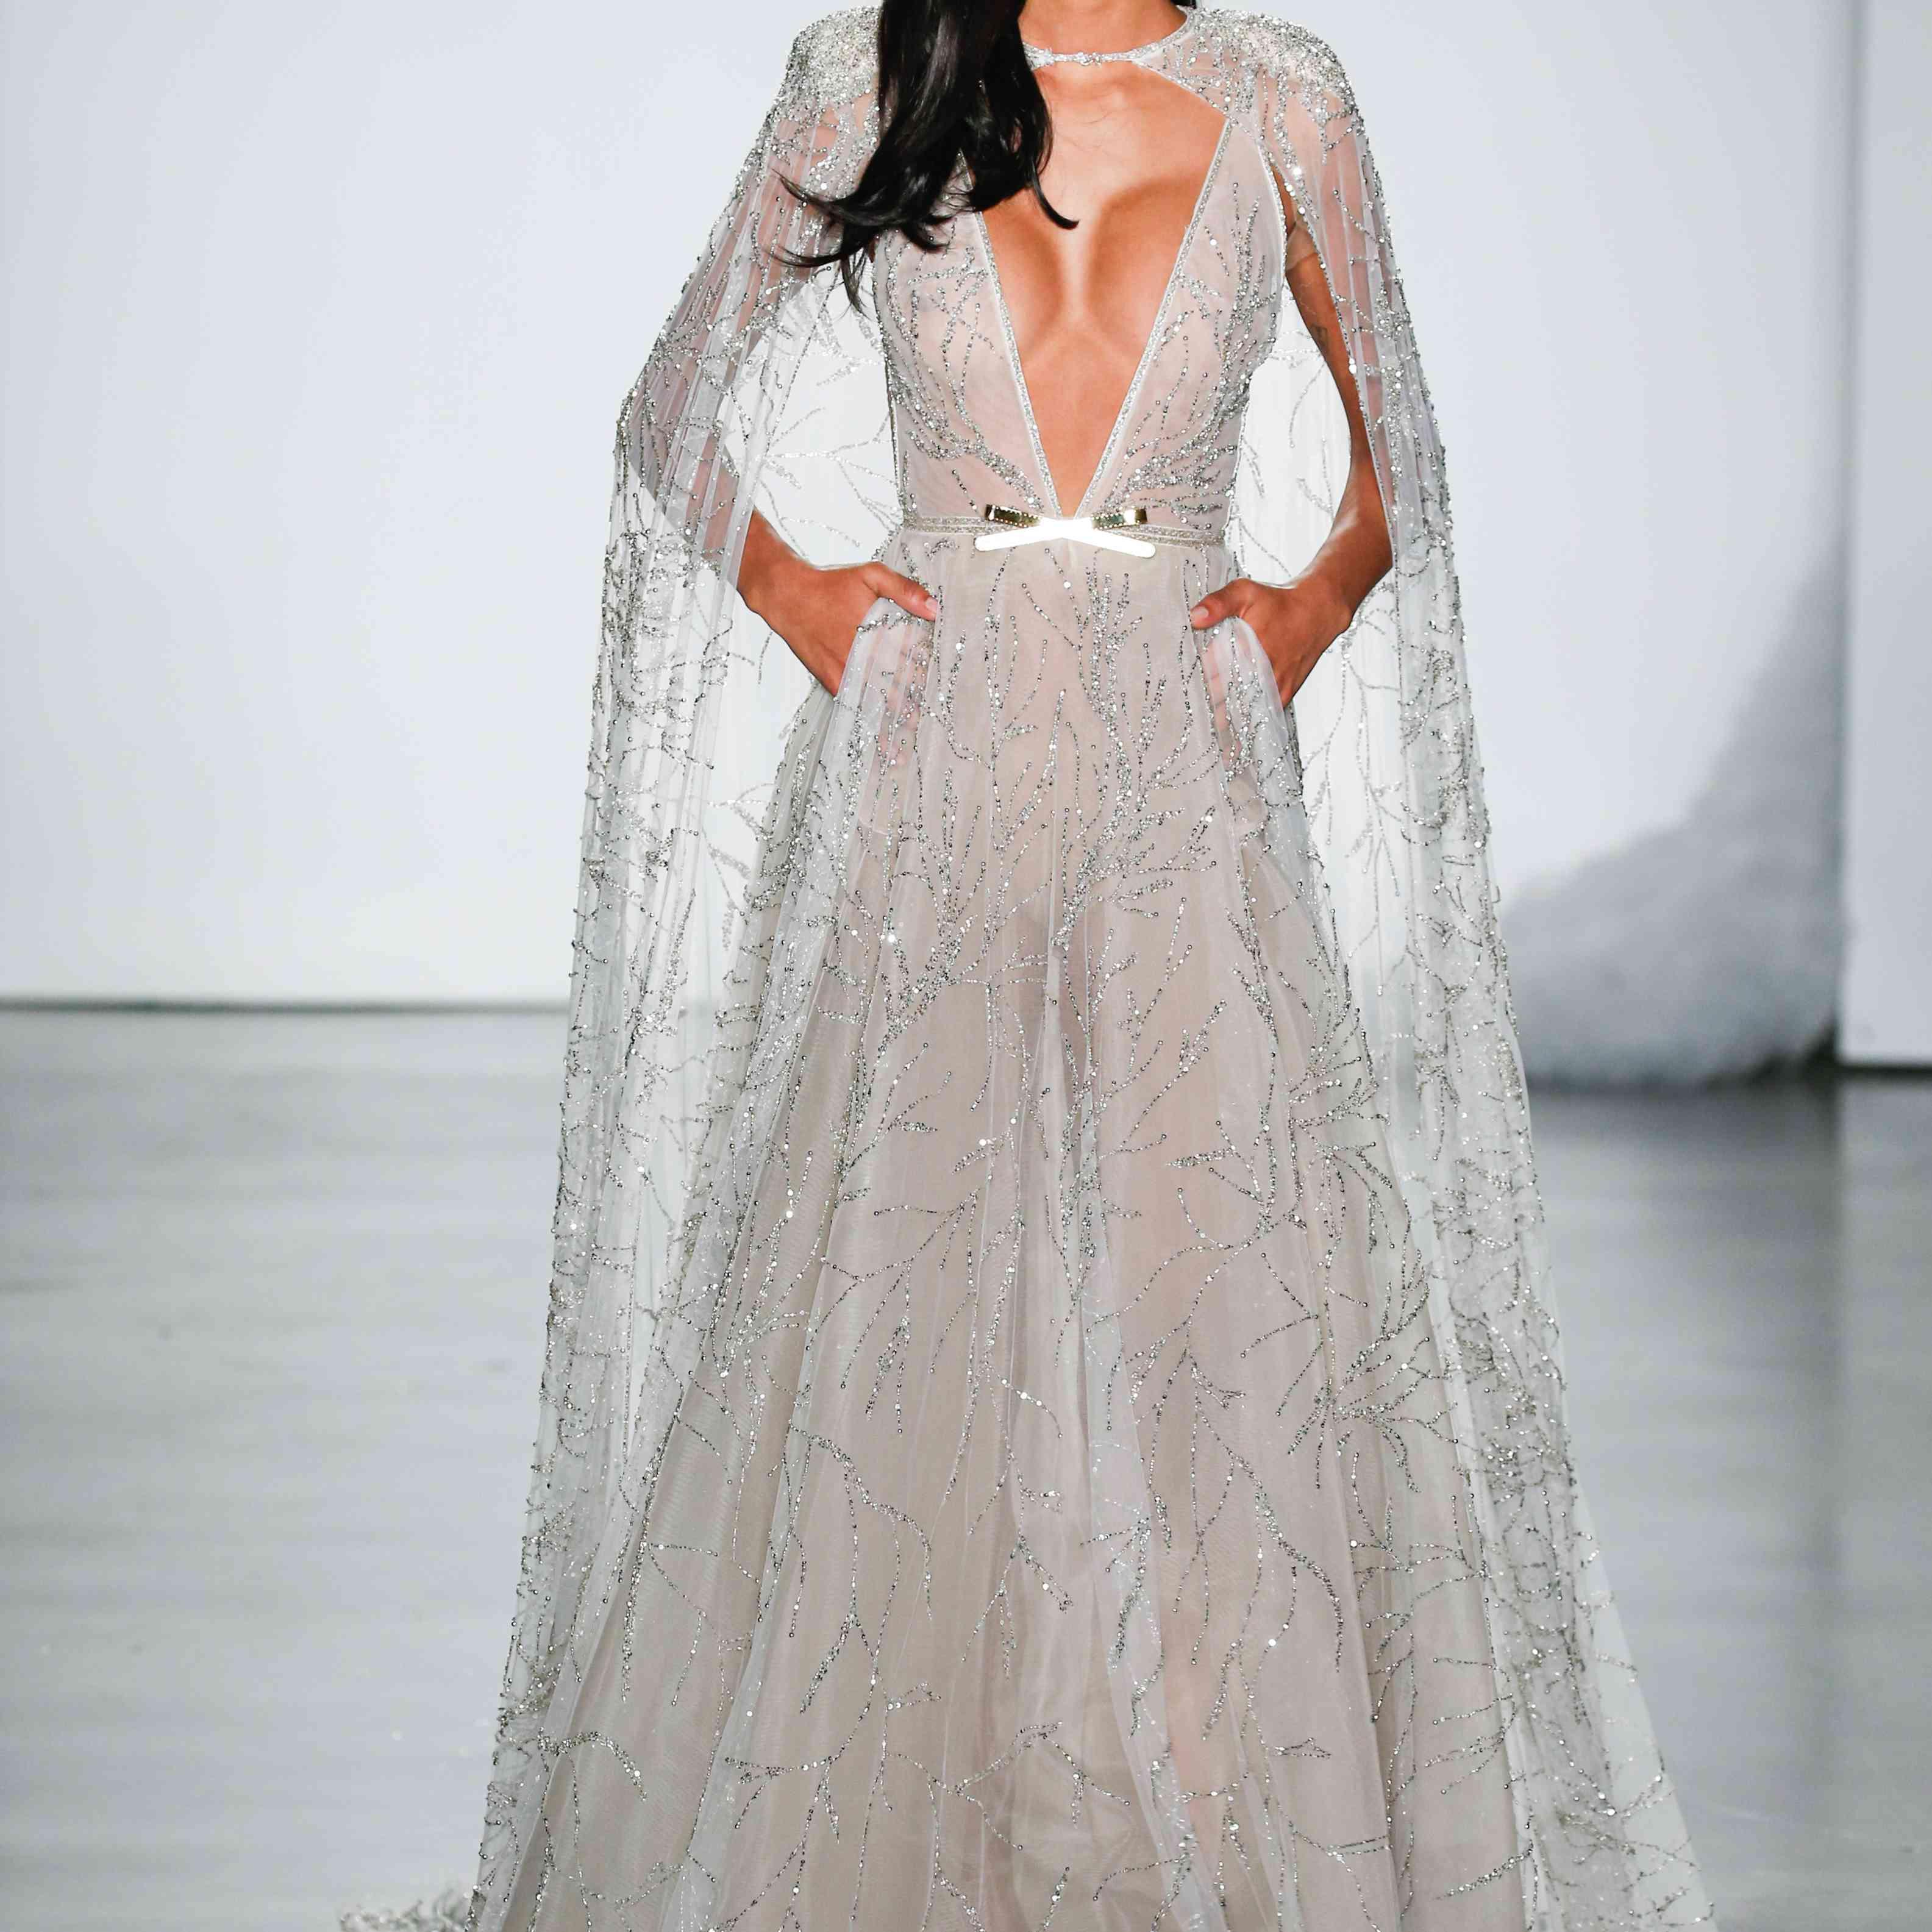 Model in deep V-cut wedding dress with cape